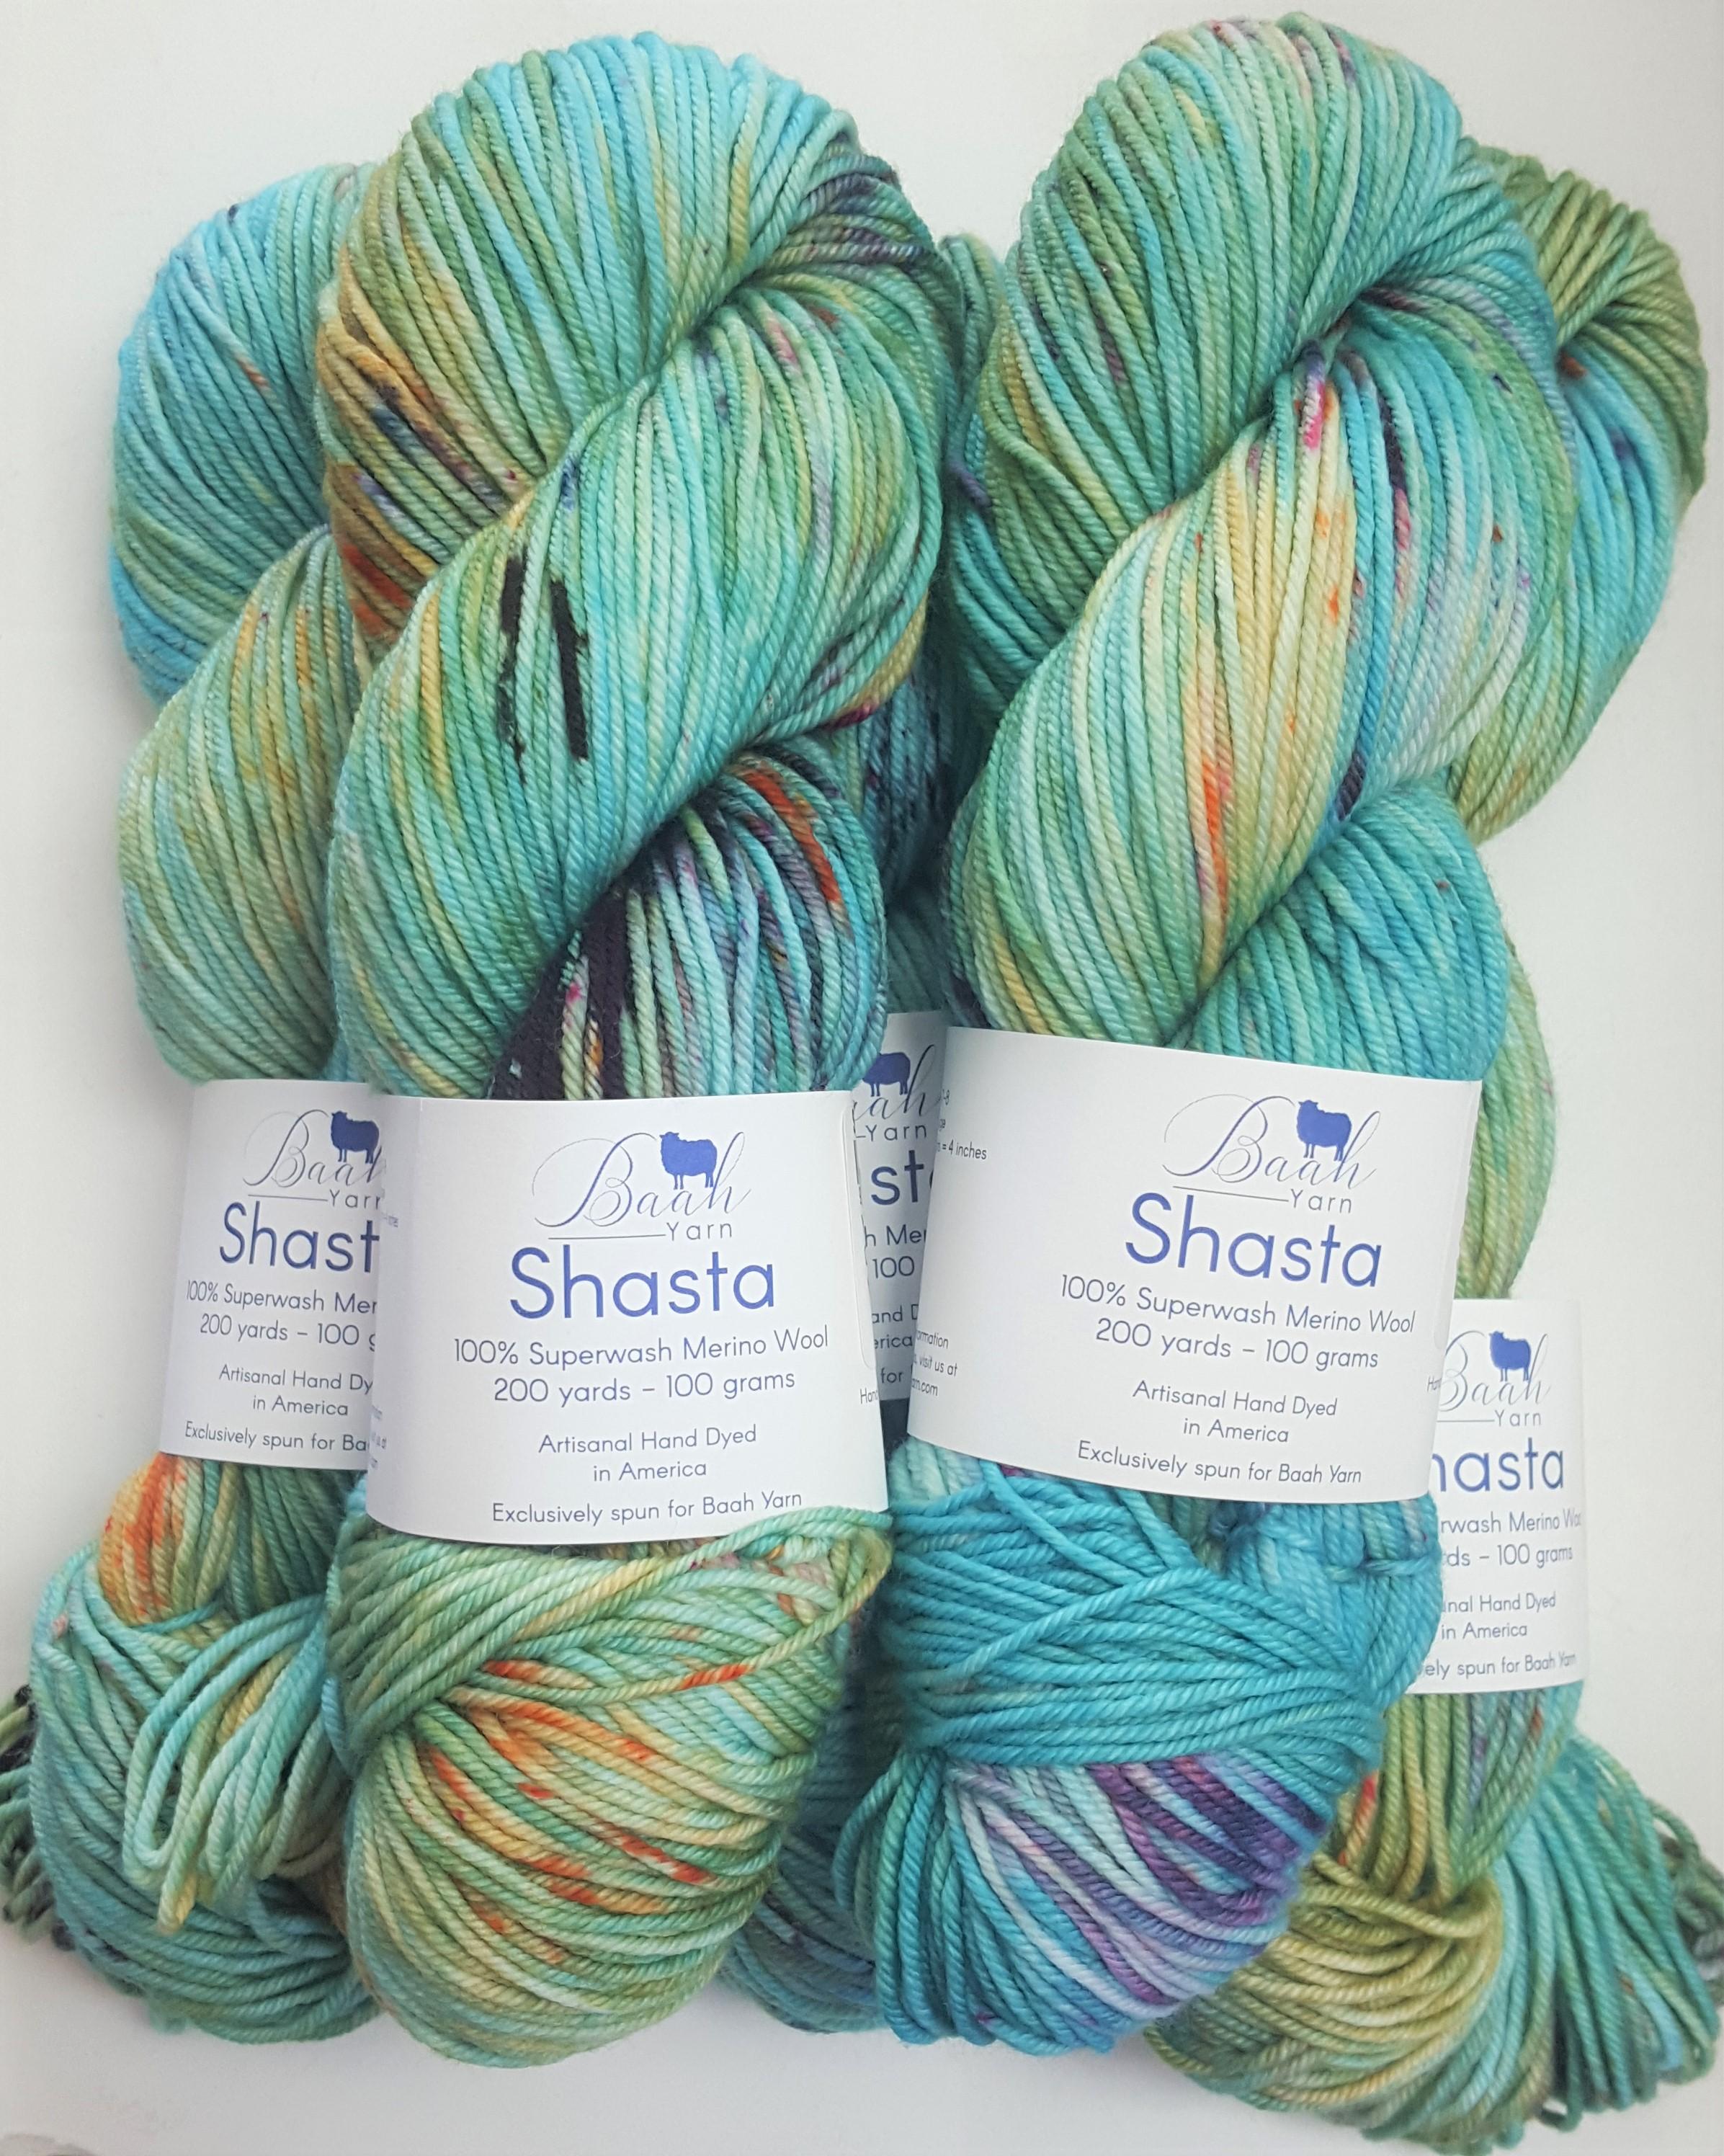 Yarn & More Signature Yarn - Shasta